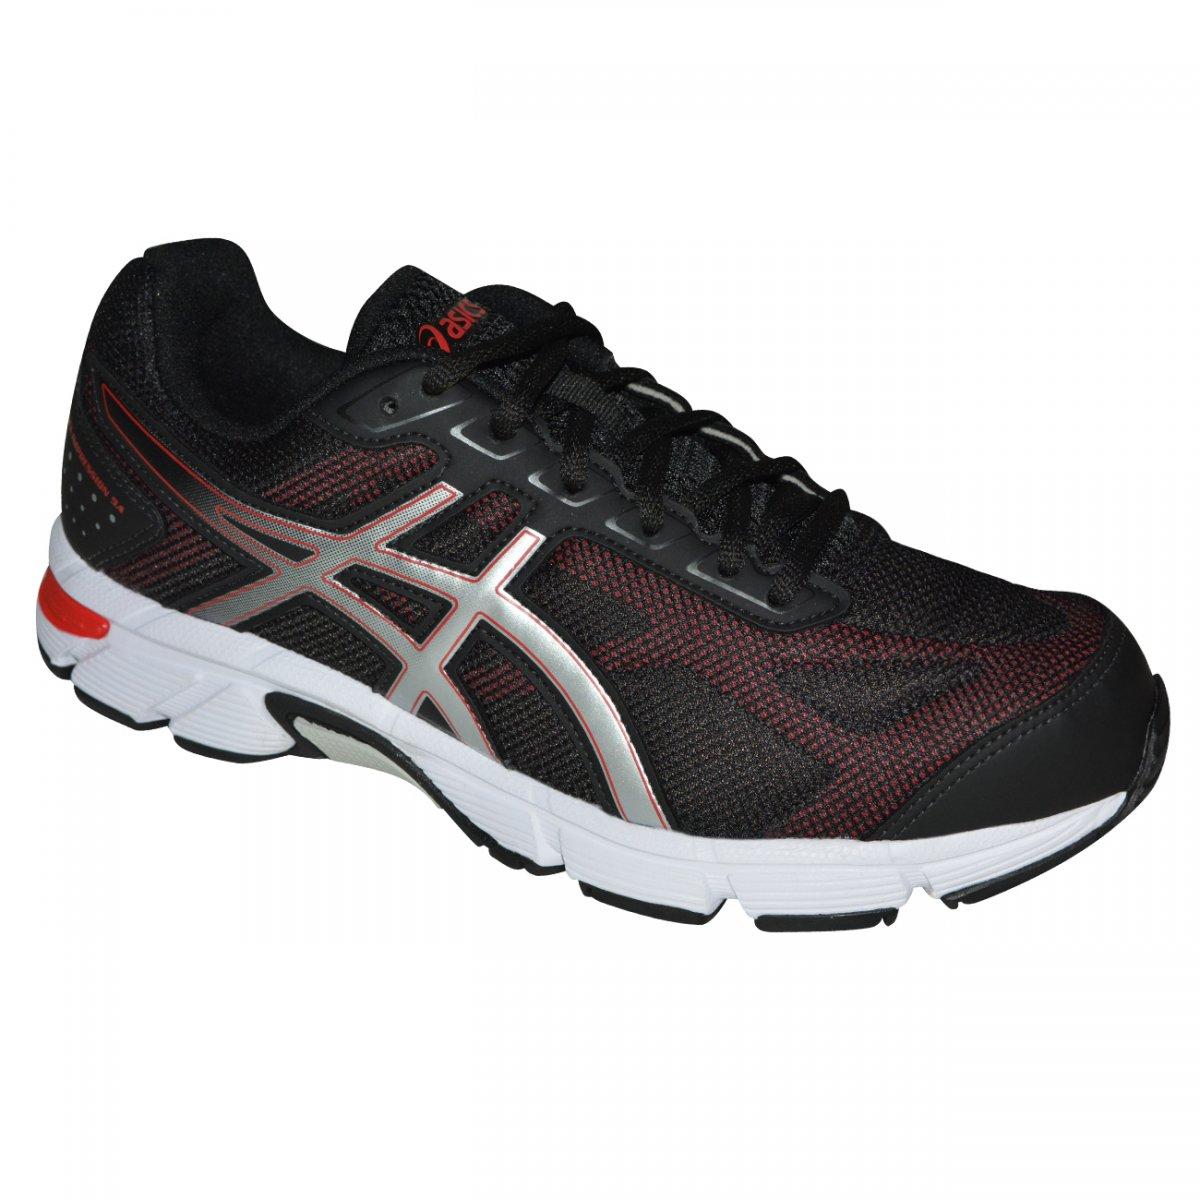 f4aaf728001 Tenis Asics Gel-impression 9 T021A 9089 - Preto vermelho prata - Chuteira  Nike